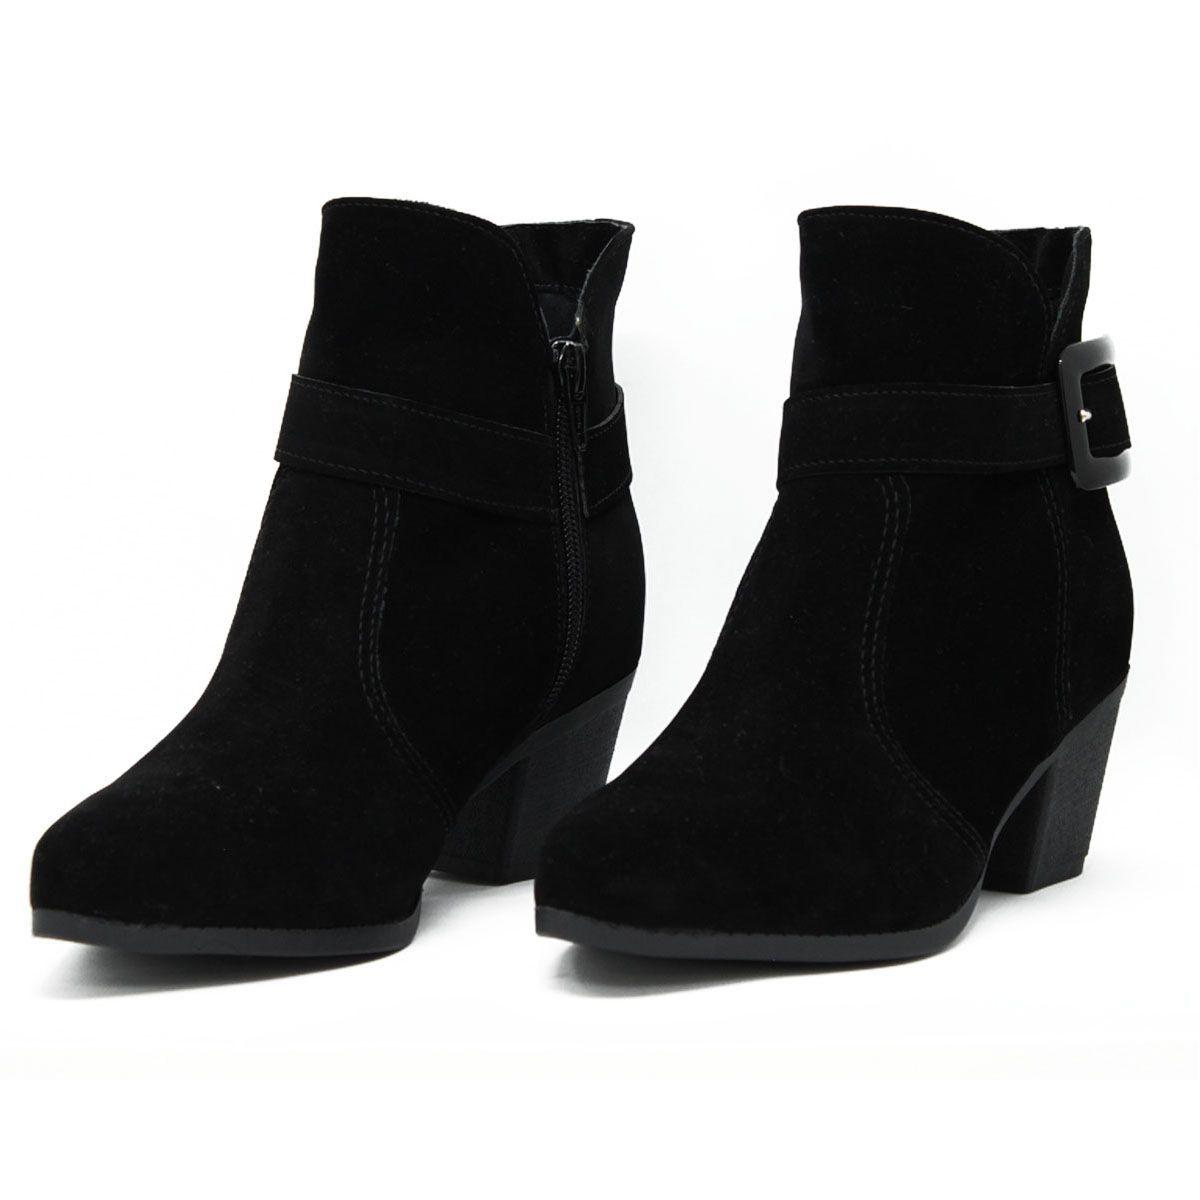 Bota Ankle Boot Feminina Salto Baixo com Fivela